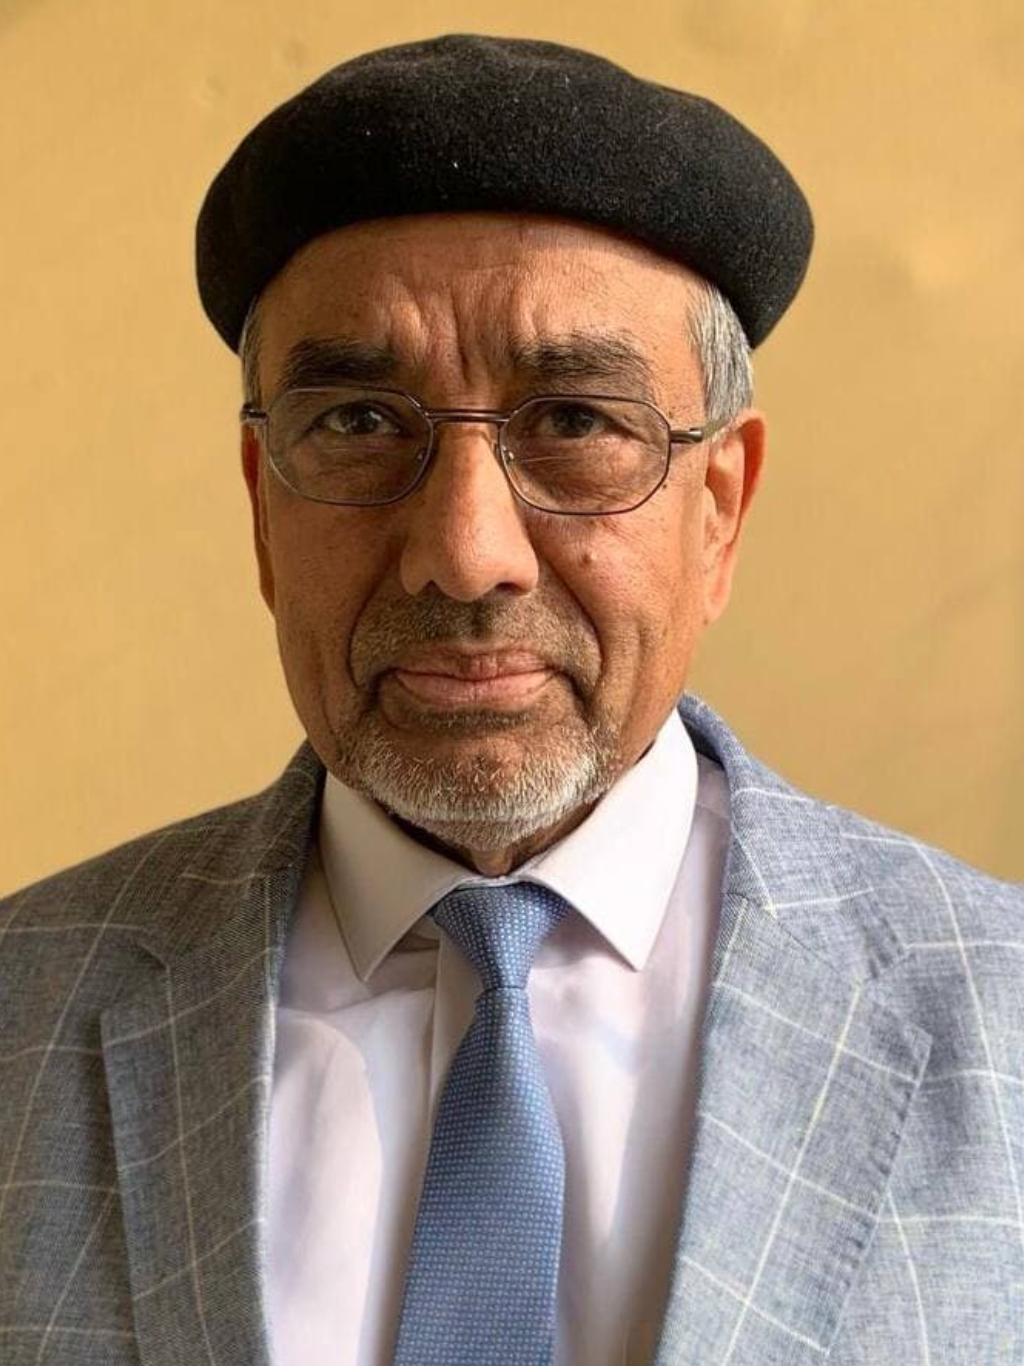 Herr Habib Ahmed Umer - Nat. Sek. Rishta Nata Nord